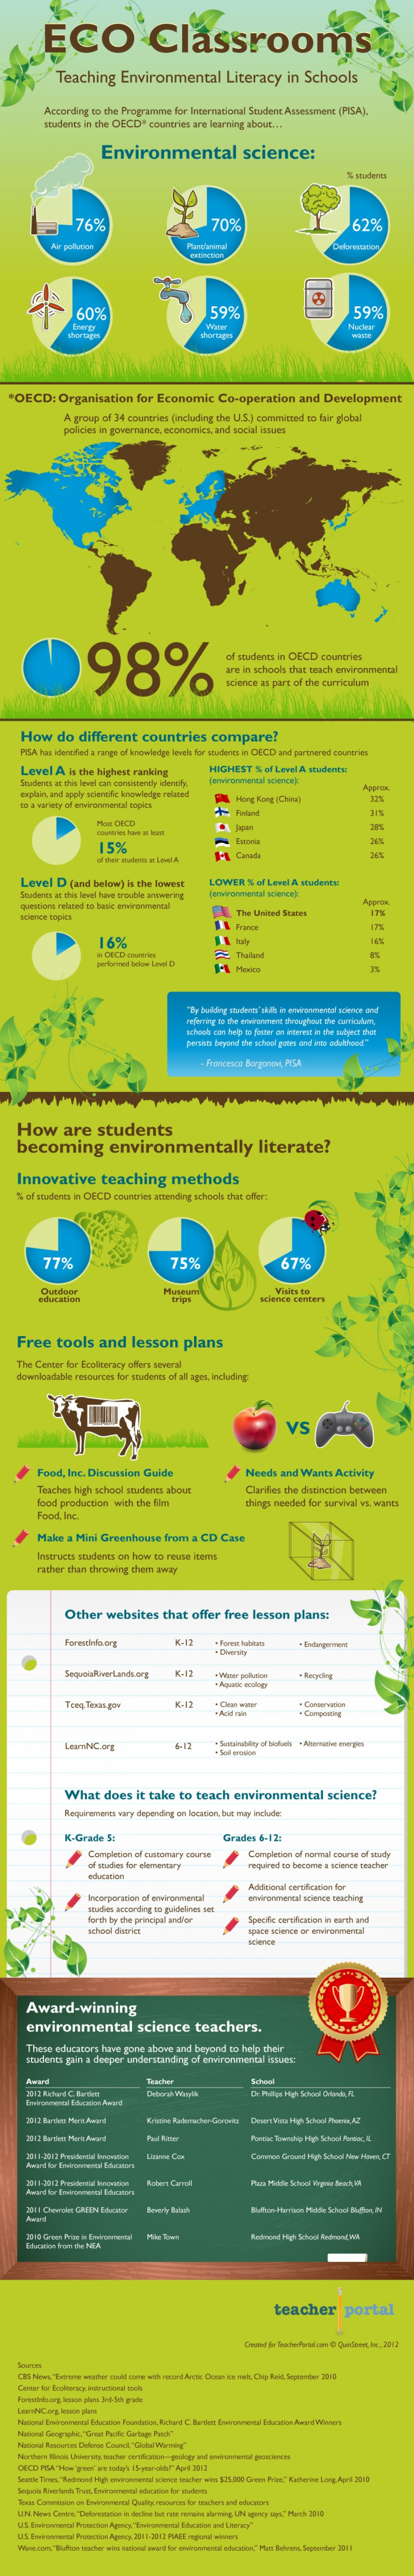 Eco classrooms